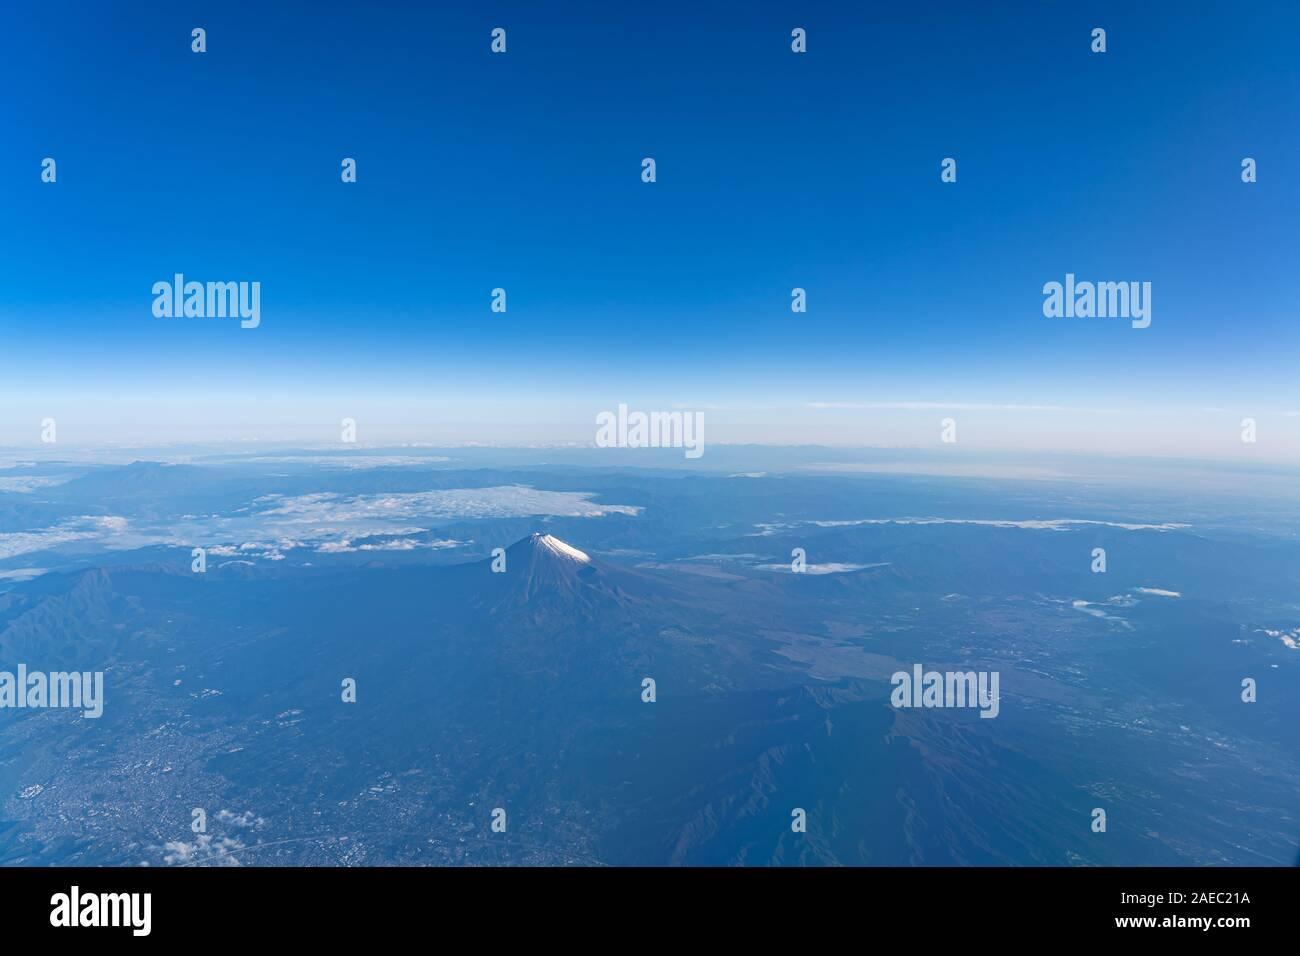 A bird's eye view close-up the Mount Fuji ( Mt. Fuji ) and blue sky. Scenery landscapes of the Fuji-Hakone-Izu National Park. Shizuoka Prefecture, Jap Stock Photo